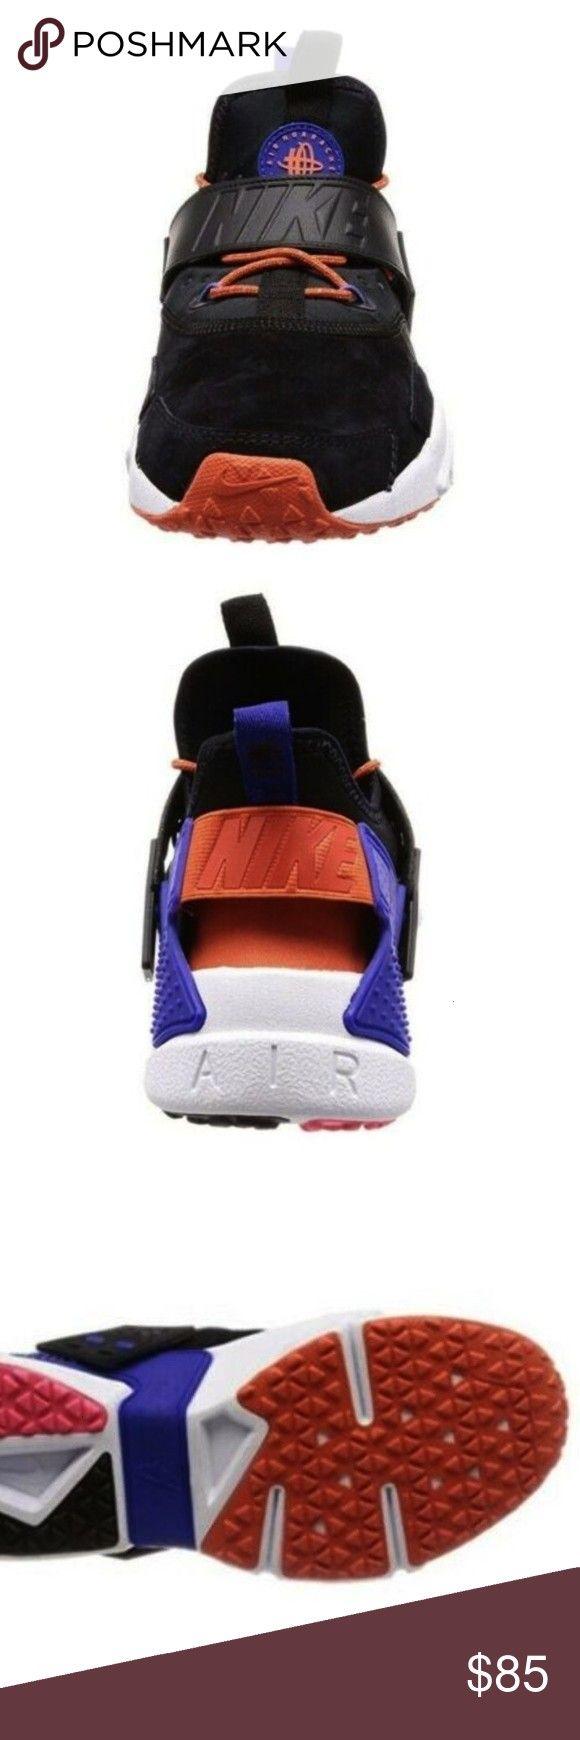 Blue Black Running Shoes AH7335 002 Size 105 Nike Mens Air Huarache Drift Nike Blue Black Running Shoes AH7335 002 Size 105 Nike Mens Air Huarache Drift Nike Blue Black R...